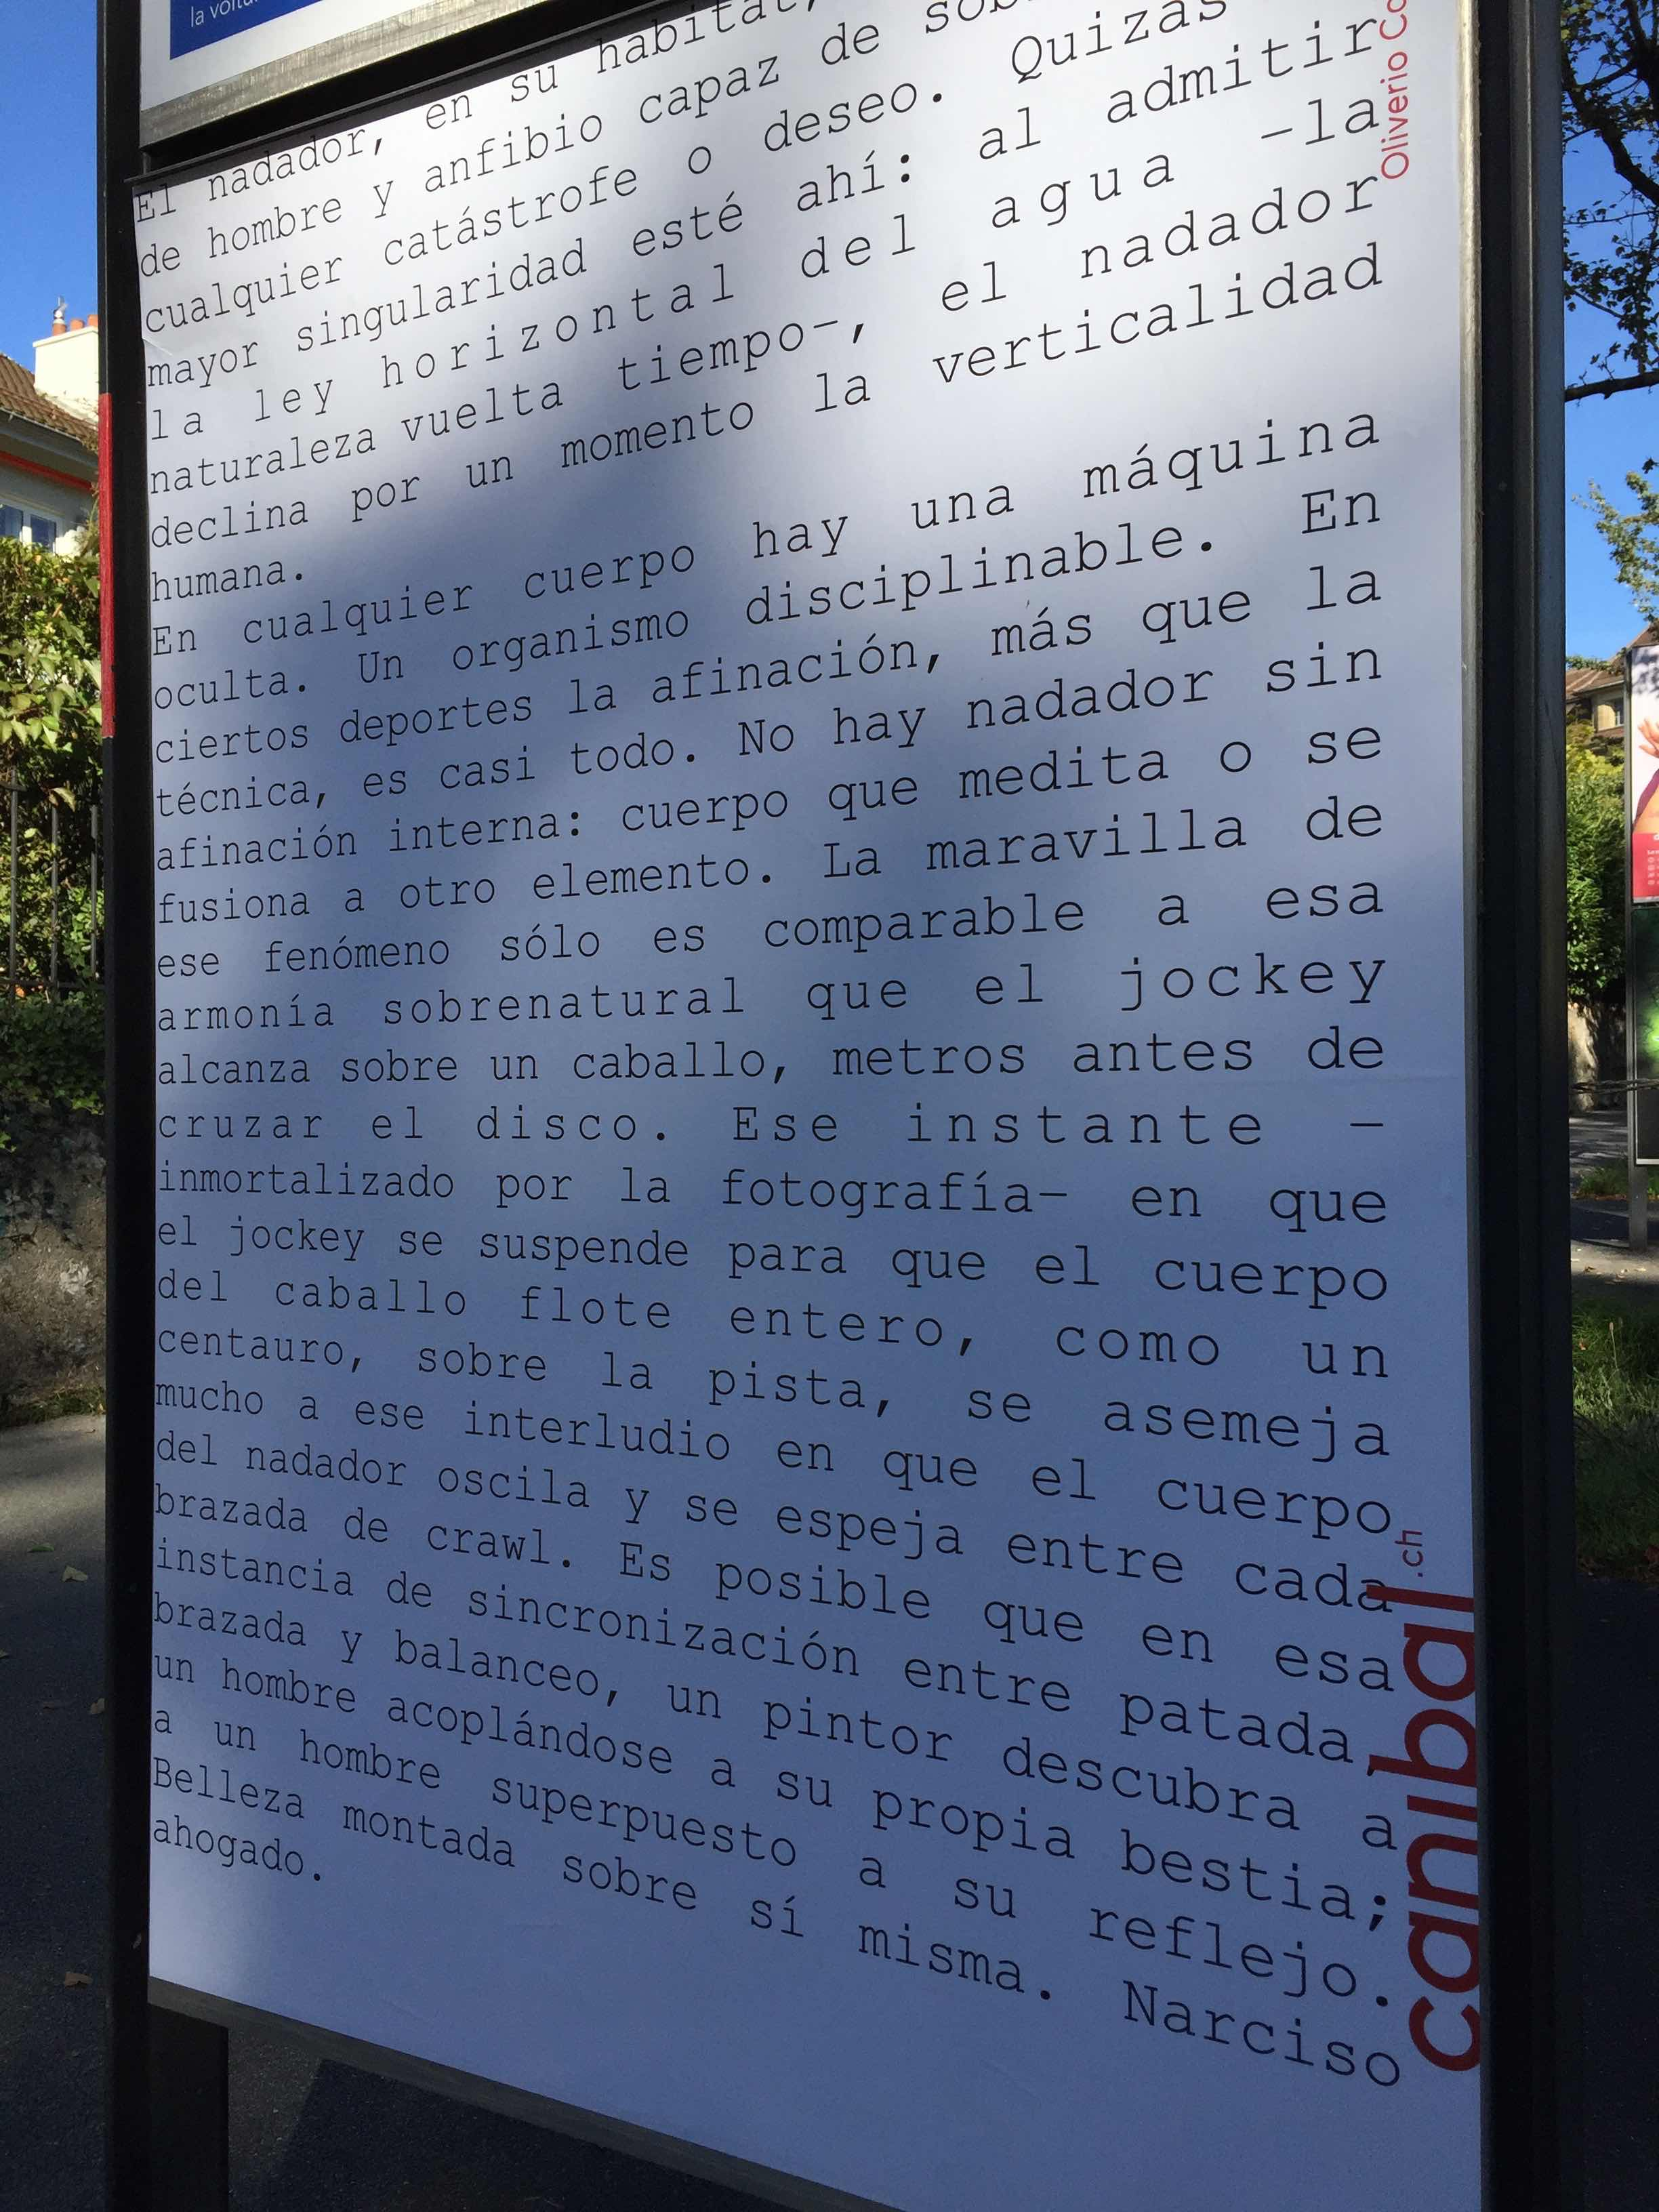 Oliverio Coelho, avenue de milan 10, Lausanne-IMG_5827